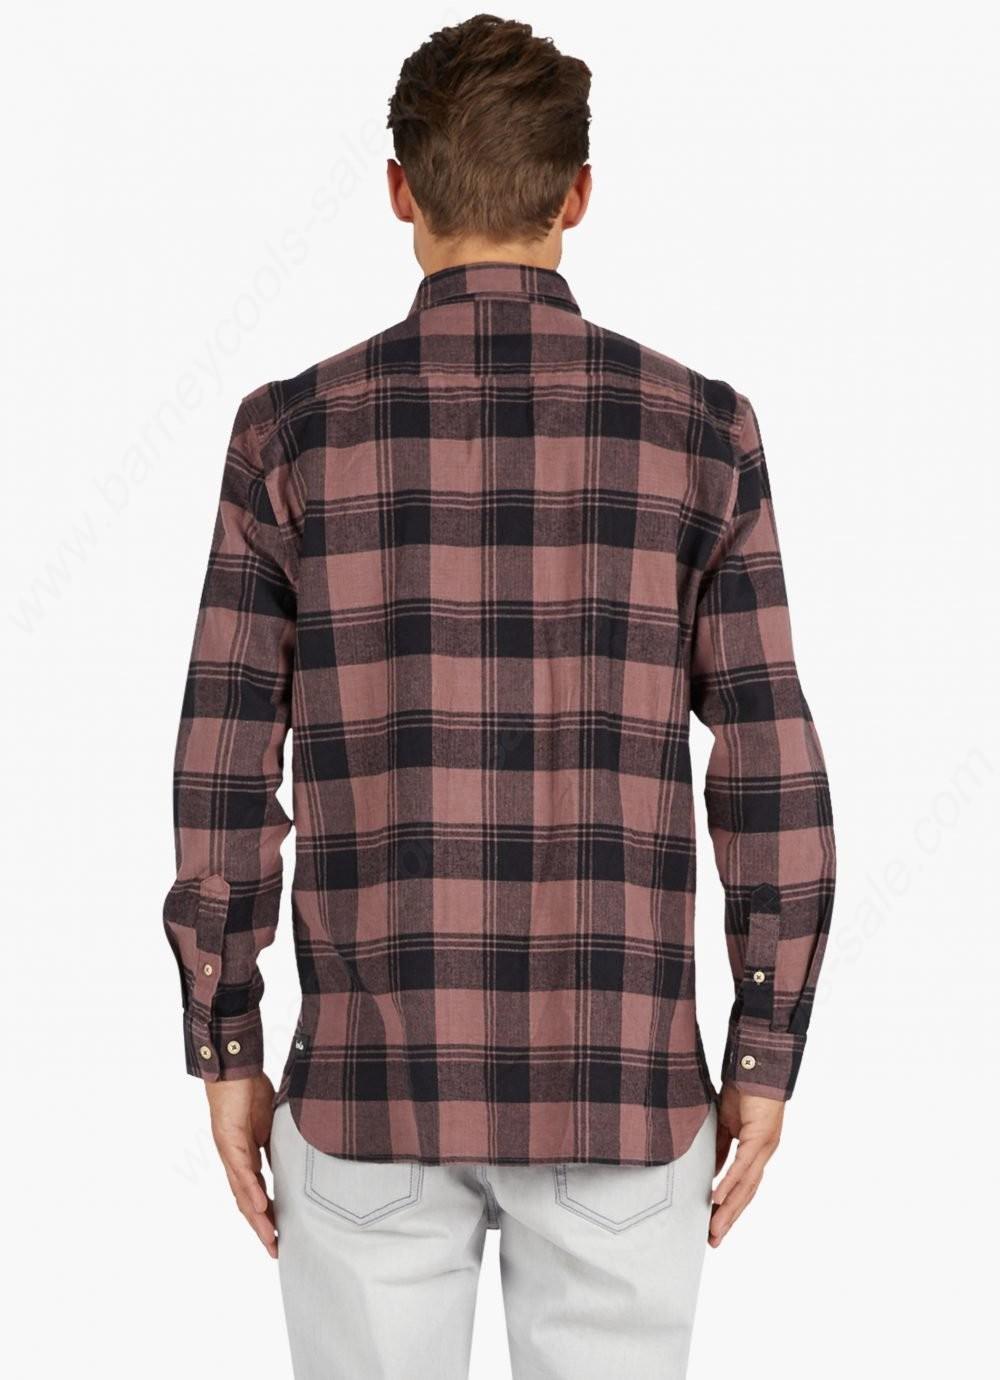 Barney Cools Mens Cabin Long Sleeve T-Shirt Rose Plaid - -4